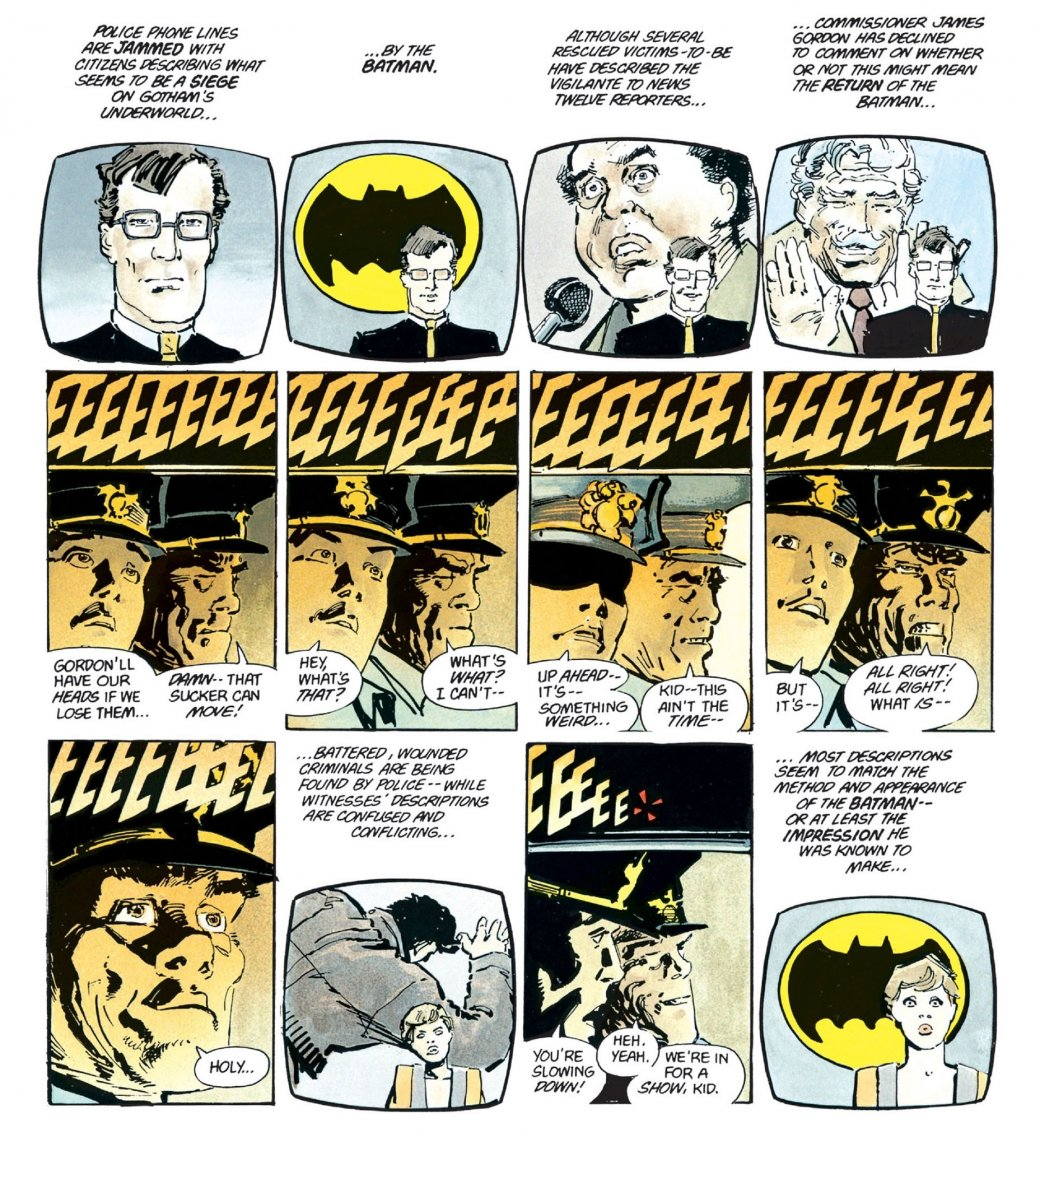 The Dark Knight: что нетак скомиксами Фрэнка Миллера про Бэтмена? | Канобу - Изображение 8